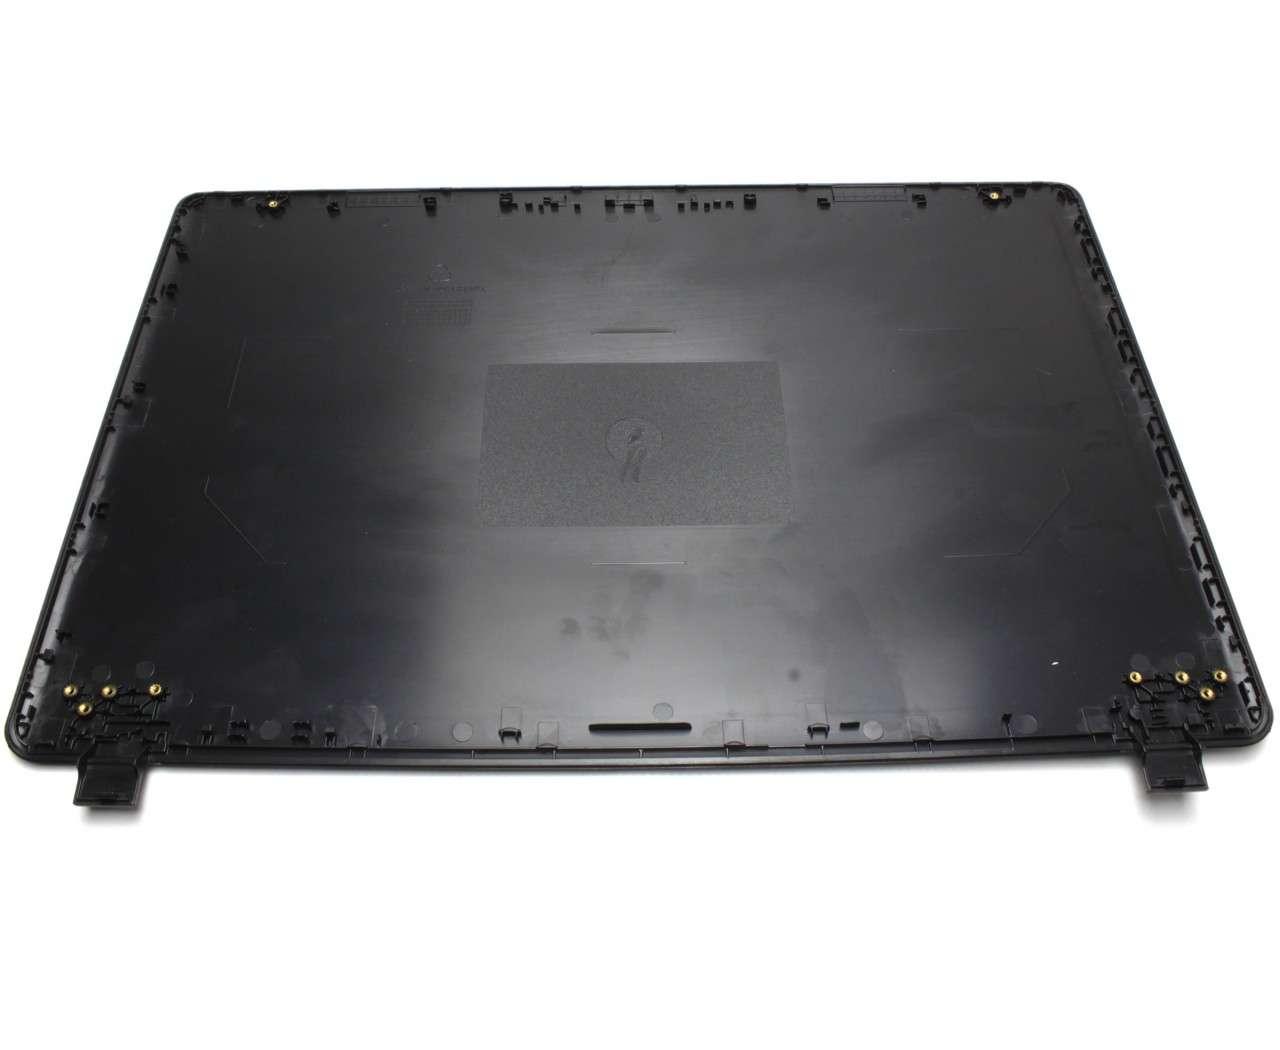 Capac Display BackCover Acer Aspire ES1-523 Carcasa Display imagine powerlaptop.ro 2021